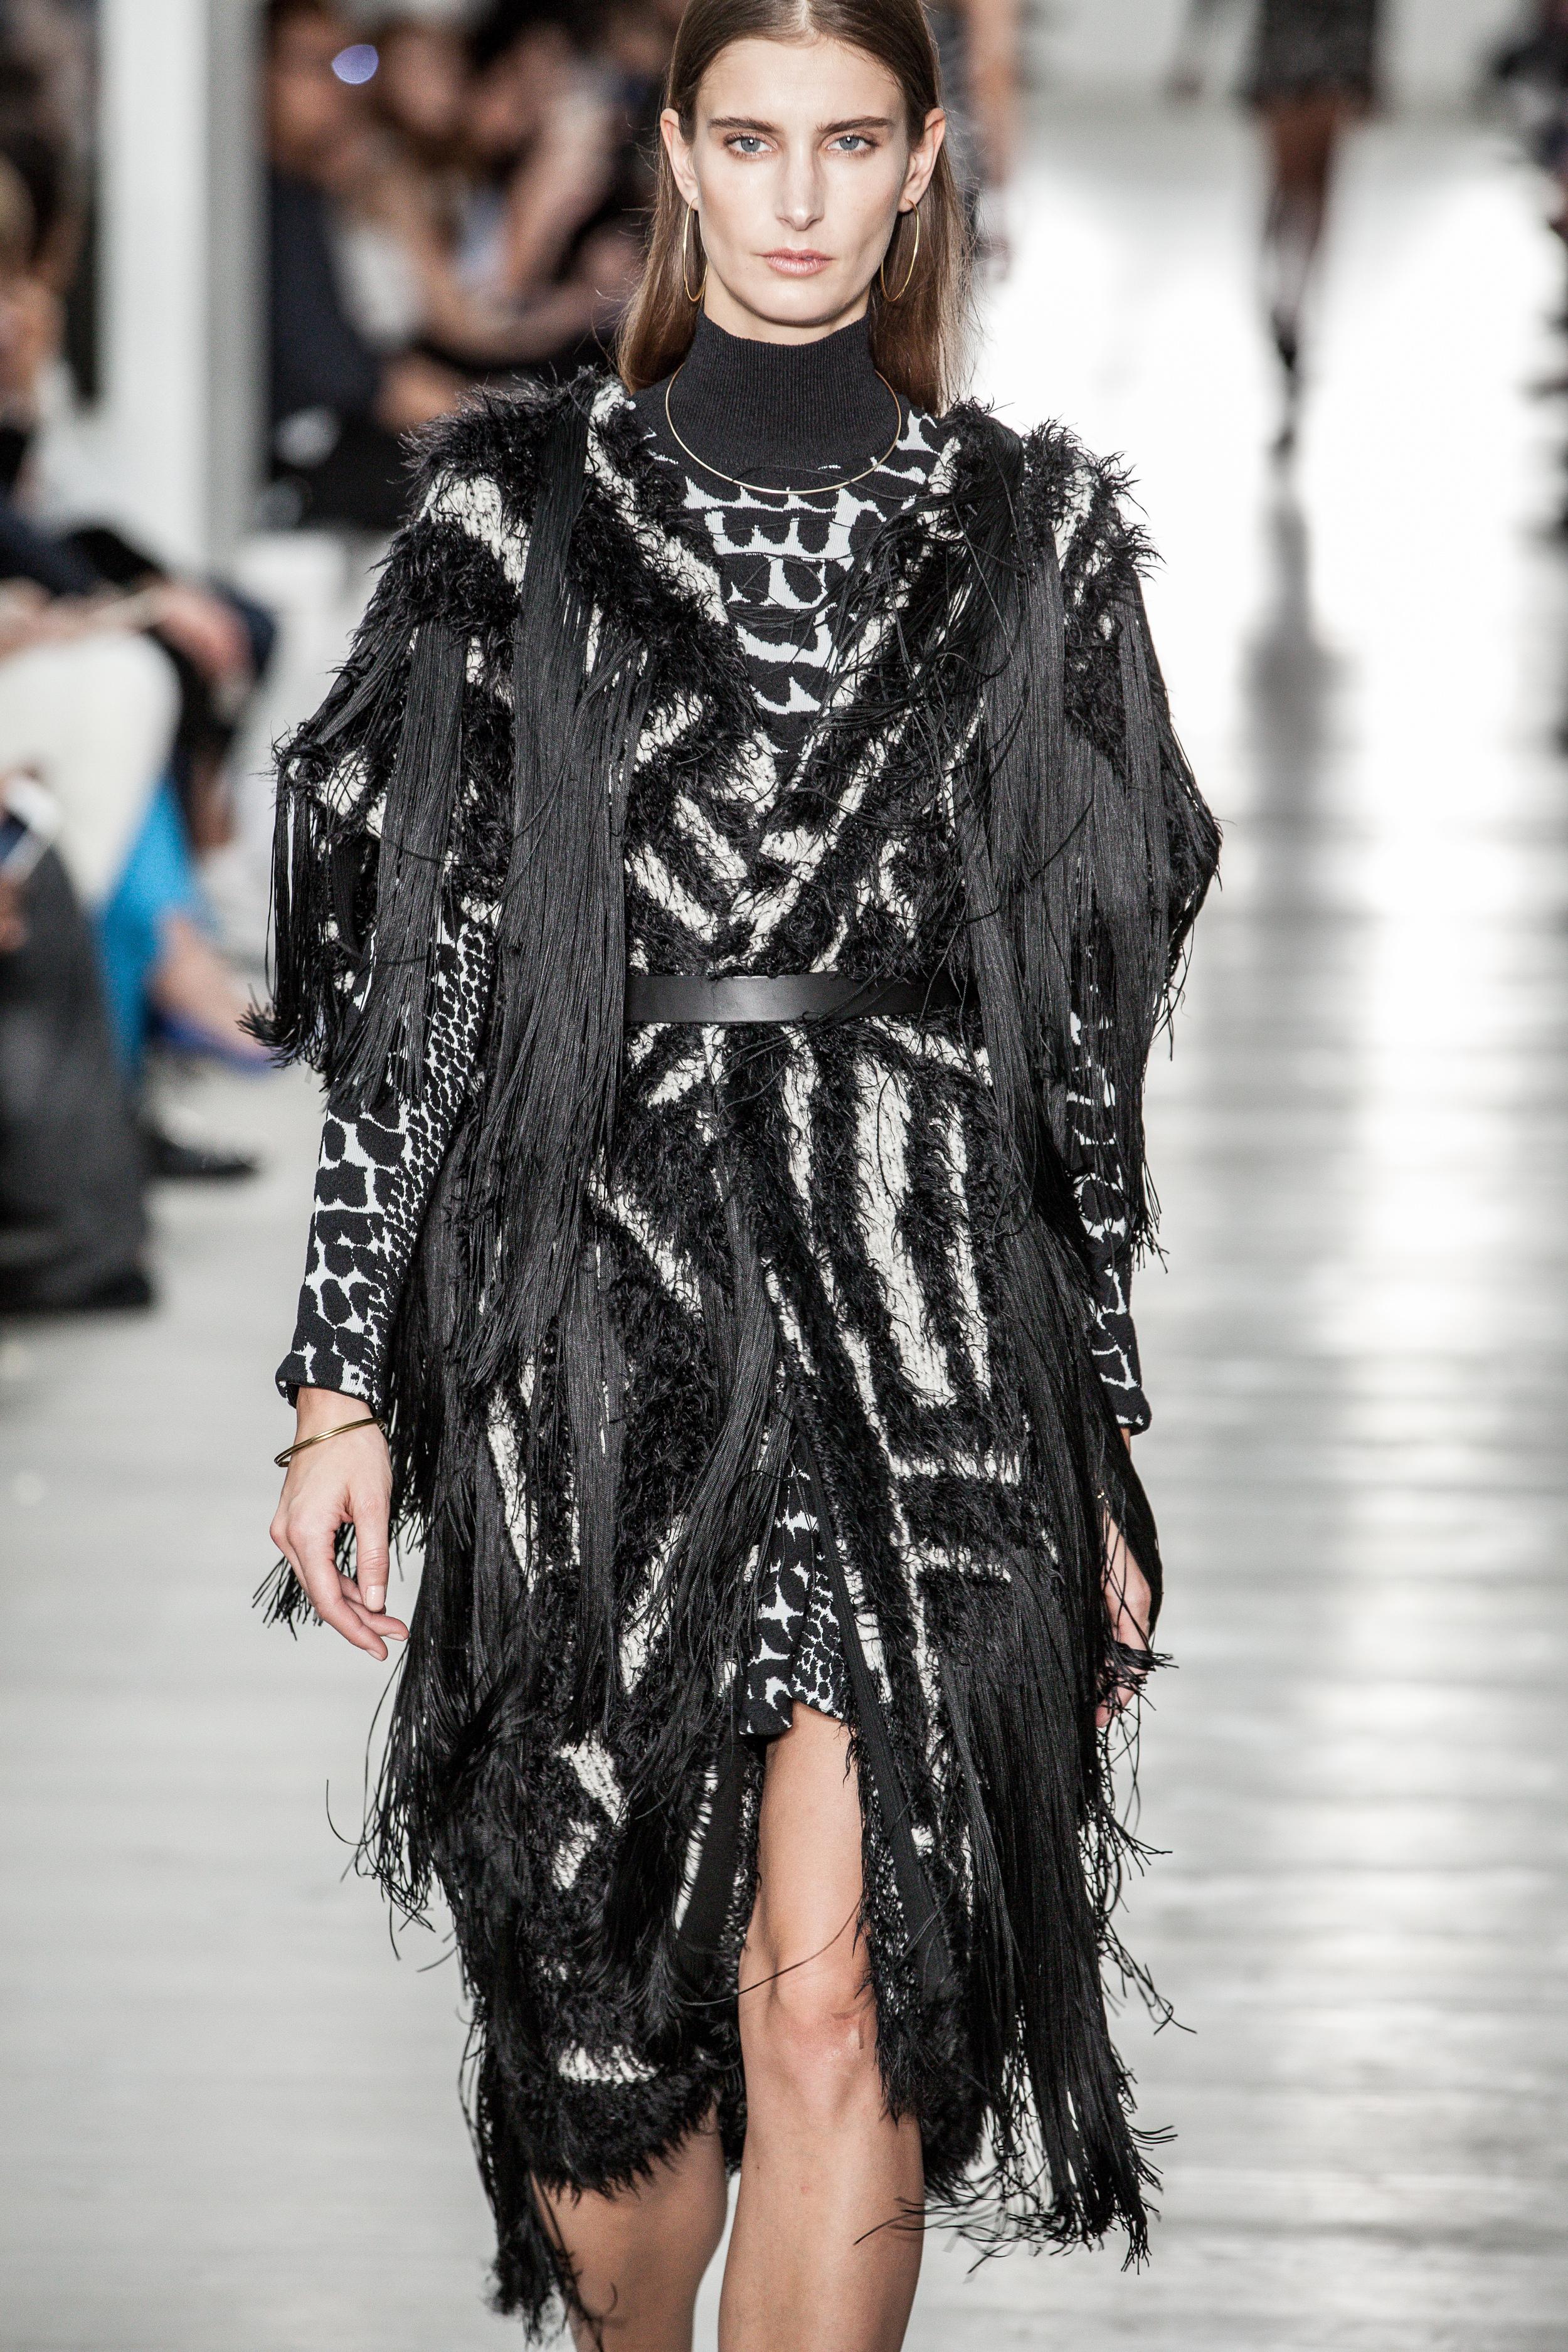 London_Fashion_Week_by_Sam_Geals_InlineSix_Photography0772.jpg